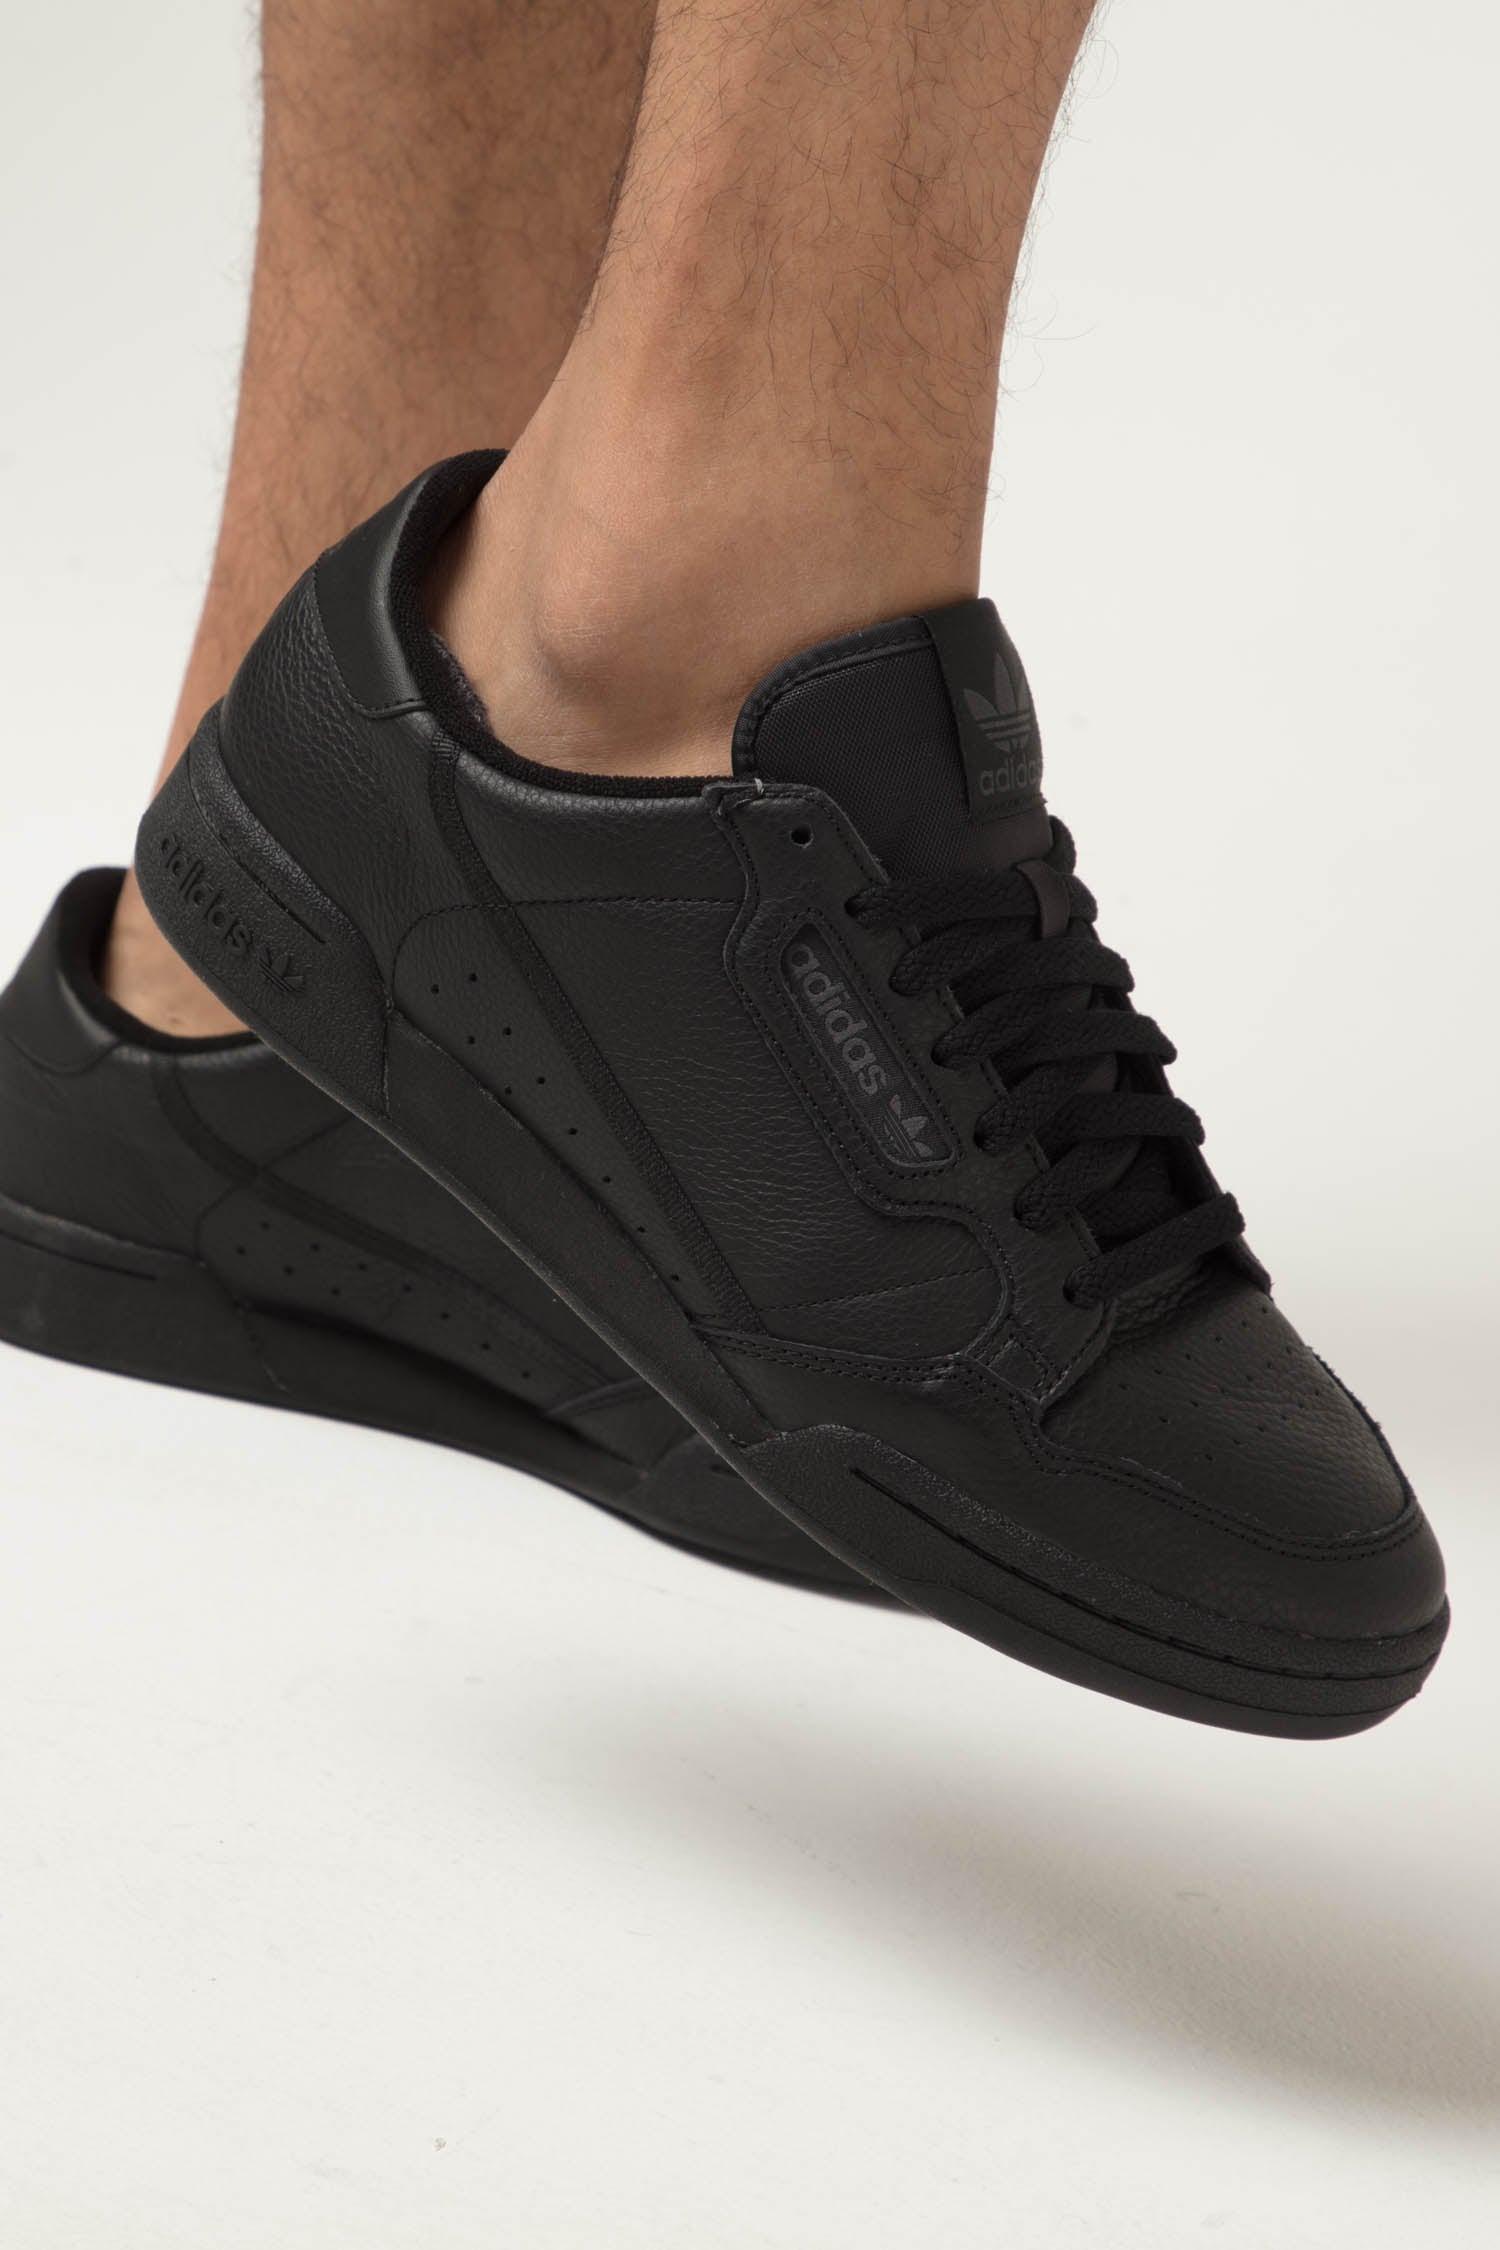 Adidas CONTINENTAL 80 Black/Black